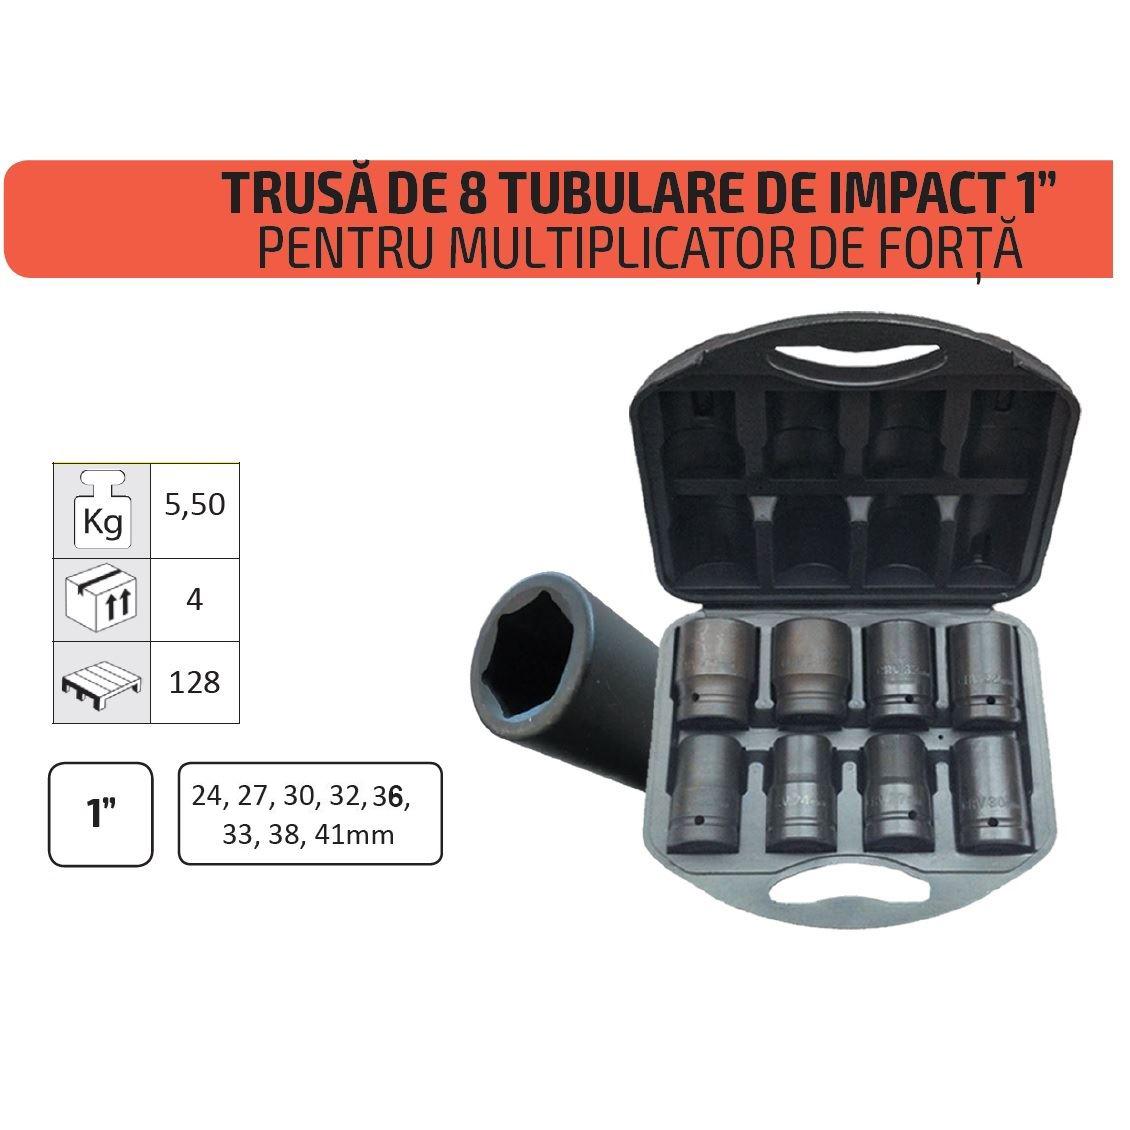 Image of Trusa 8 tubulare camion tir de impact prindere 1 tol marime 24-41mm